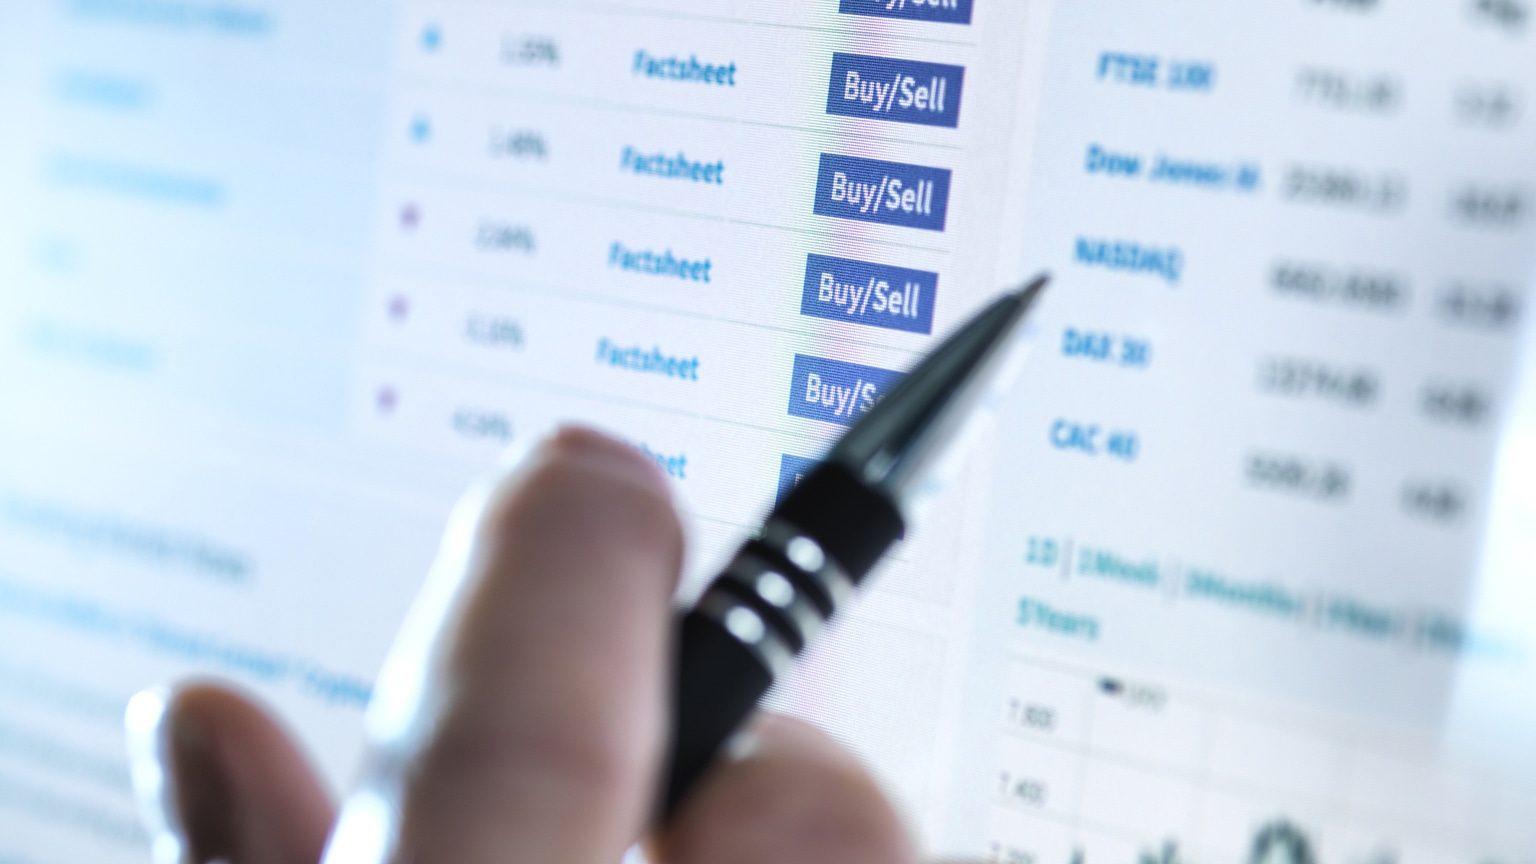 Closeup of hand running through list of stocks on computer